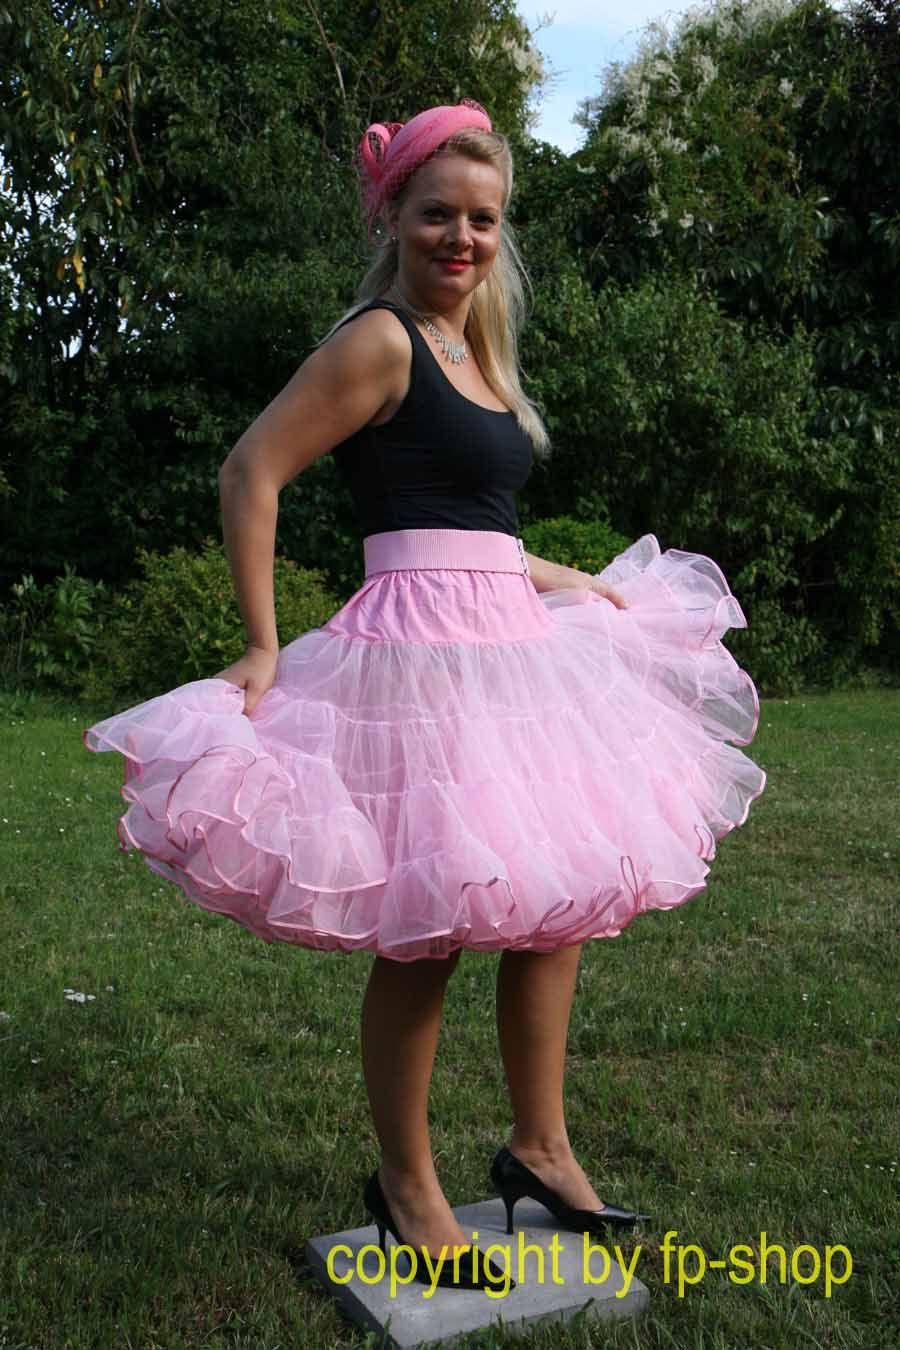 petticoat rosa petticoat malco modes 575 flying. Black Bedroom Furniture Sets. Home Design Ideas